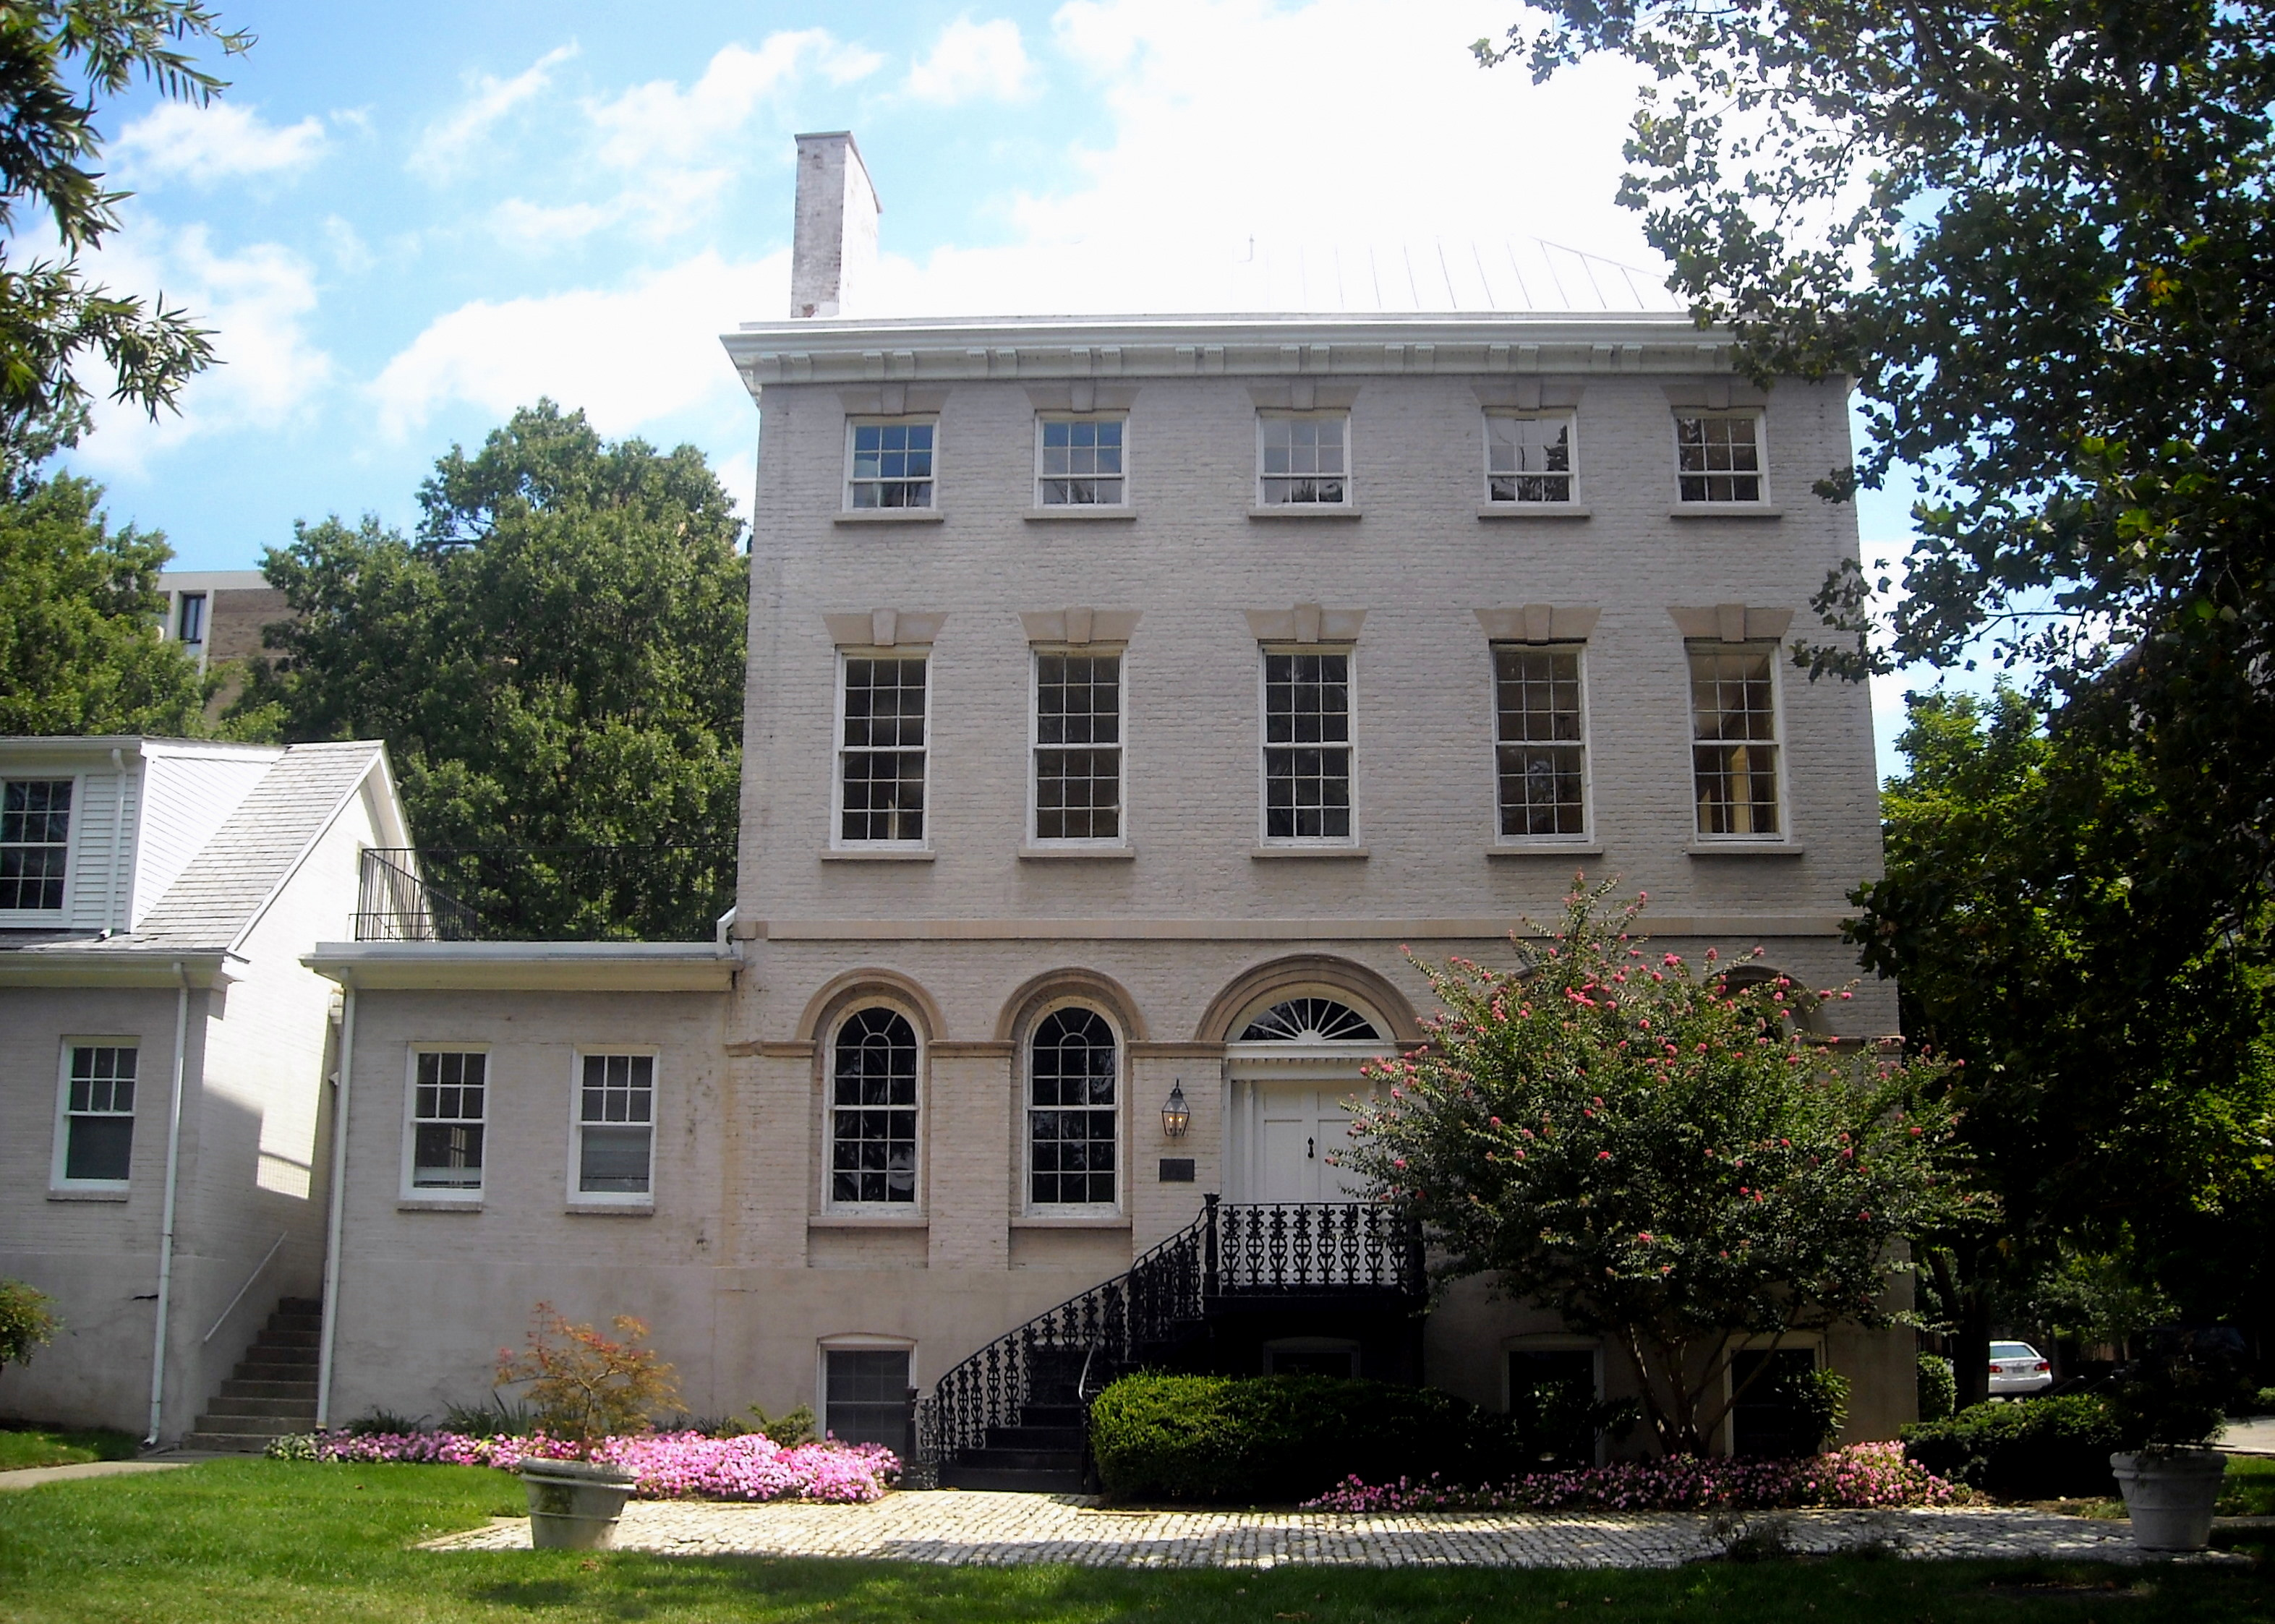 File:Thomas Law House - Washington, D.C..jpg - Wikimedia ...